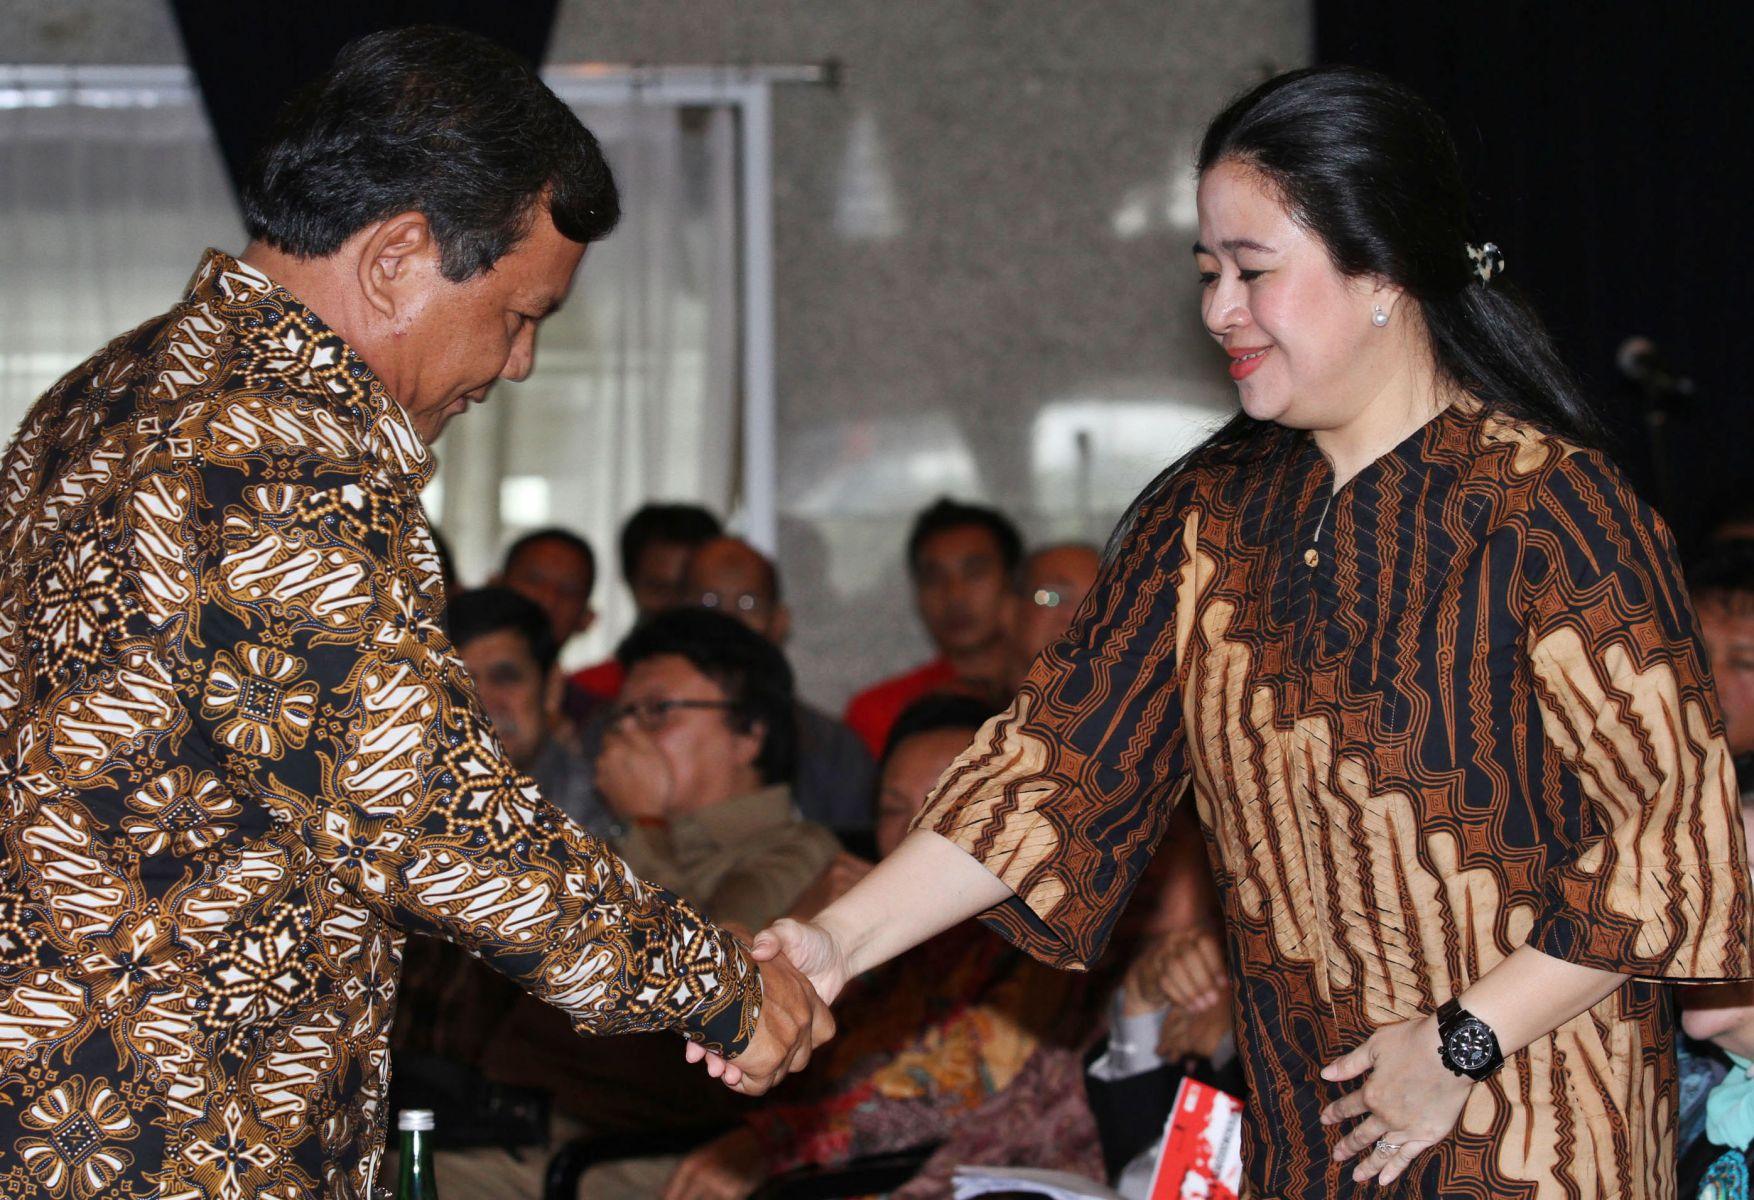 Survei Polmatrix: Prabowo-Puan Paling Kuat, Siapa Penantang Terdekatnya?